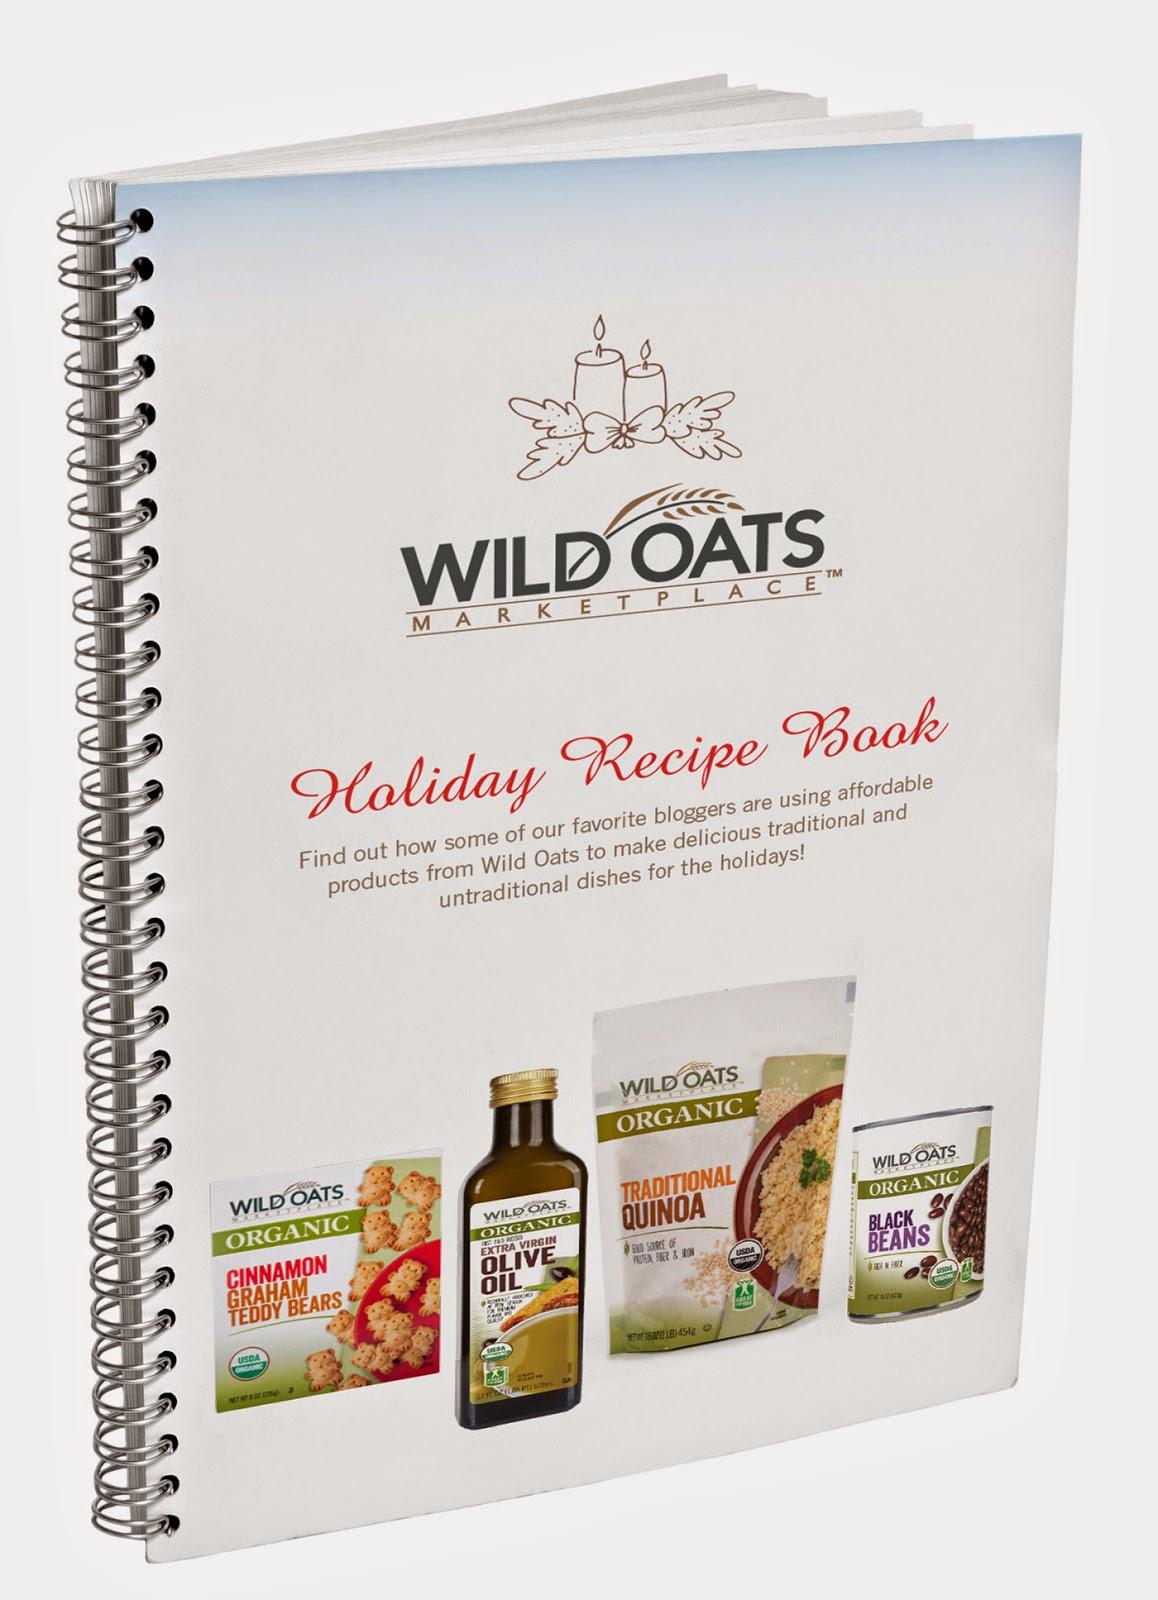 http://wildoats.com/wp-content/uploads/2014/12/WORECIPEEBOOK.pdf